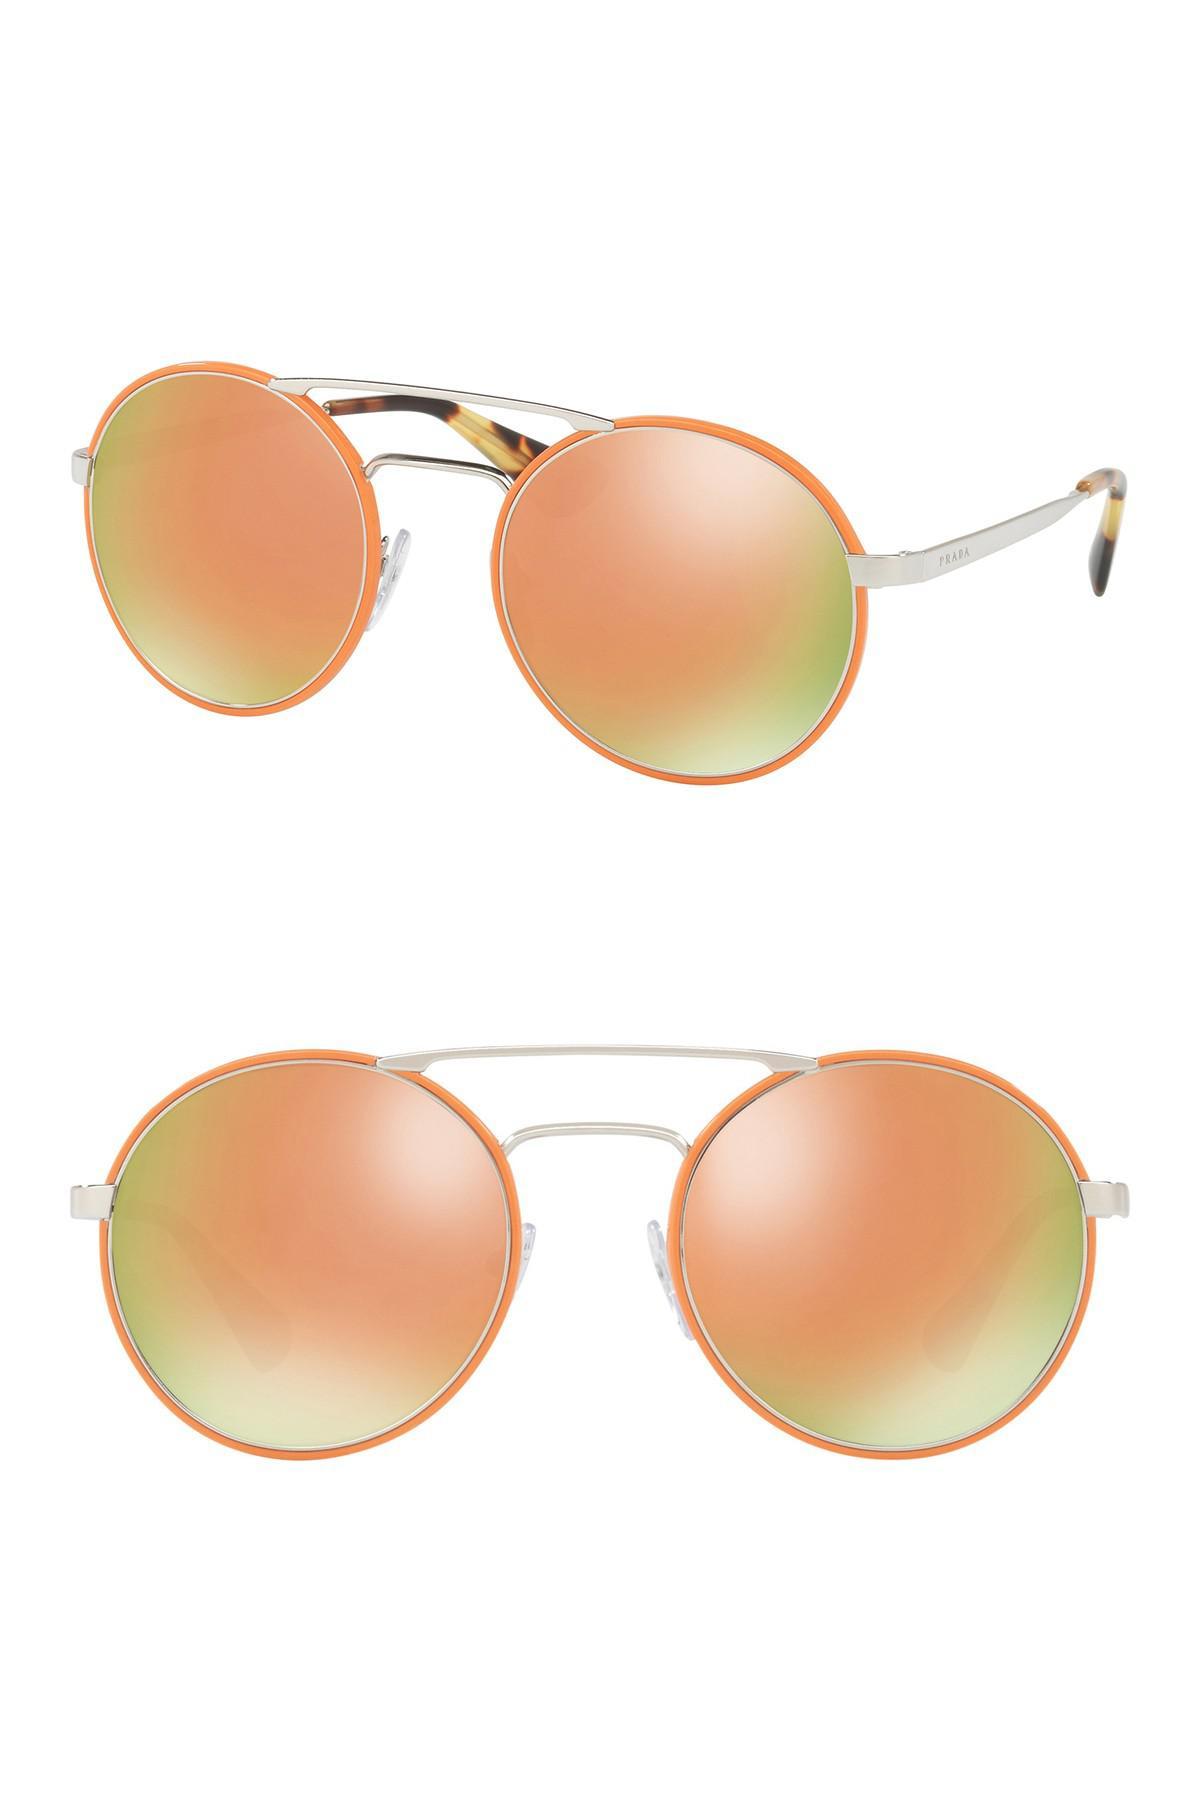 fe50a7faaf453 Prada Catwalk 54mm Round Sunglasses in Orange - Lyst